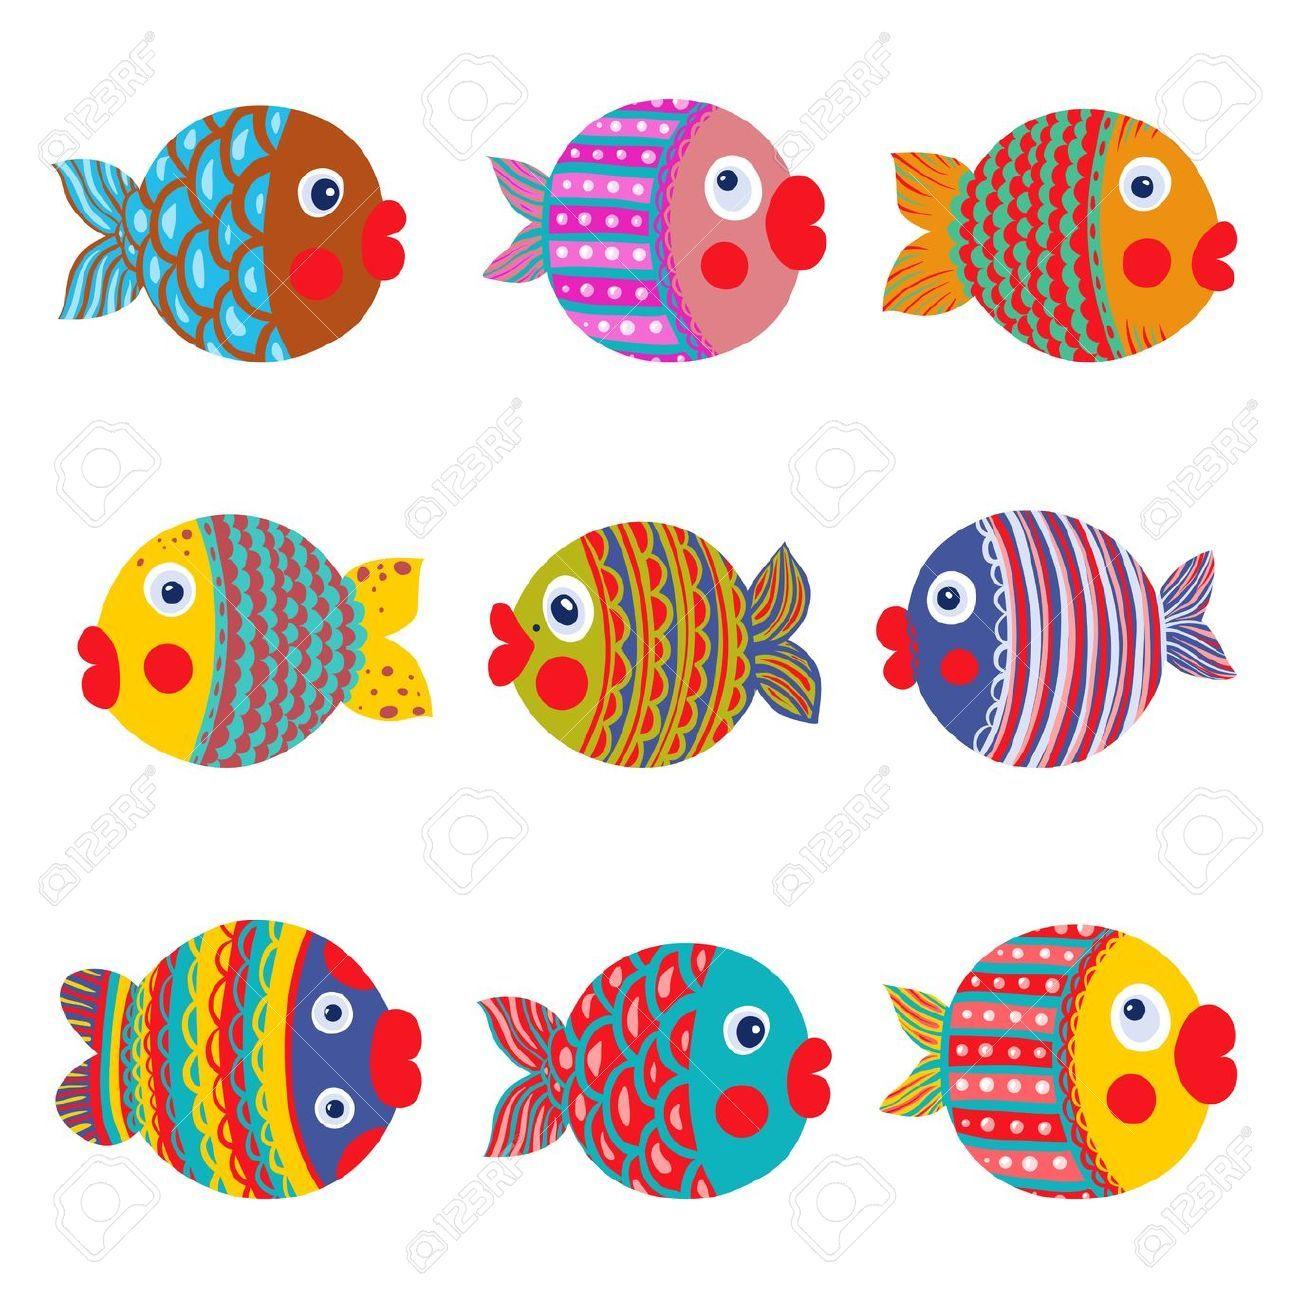 Pin De Dirce Em Papiemache Peixes Coloridos Desenho De Peixe